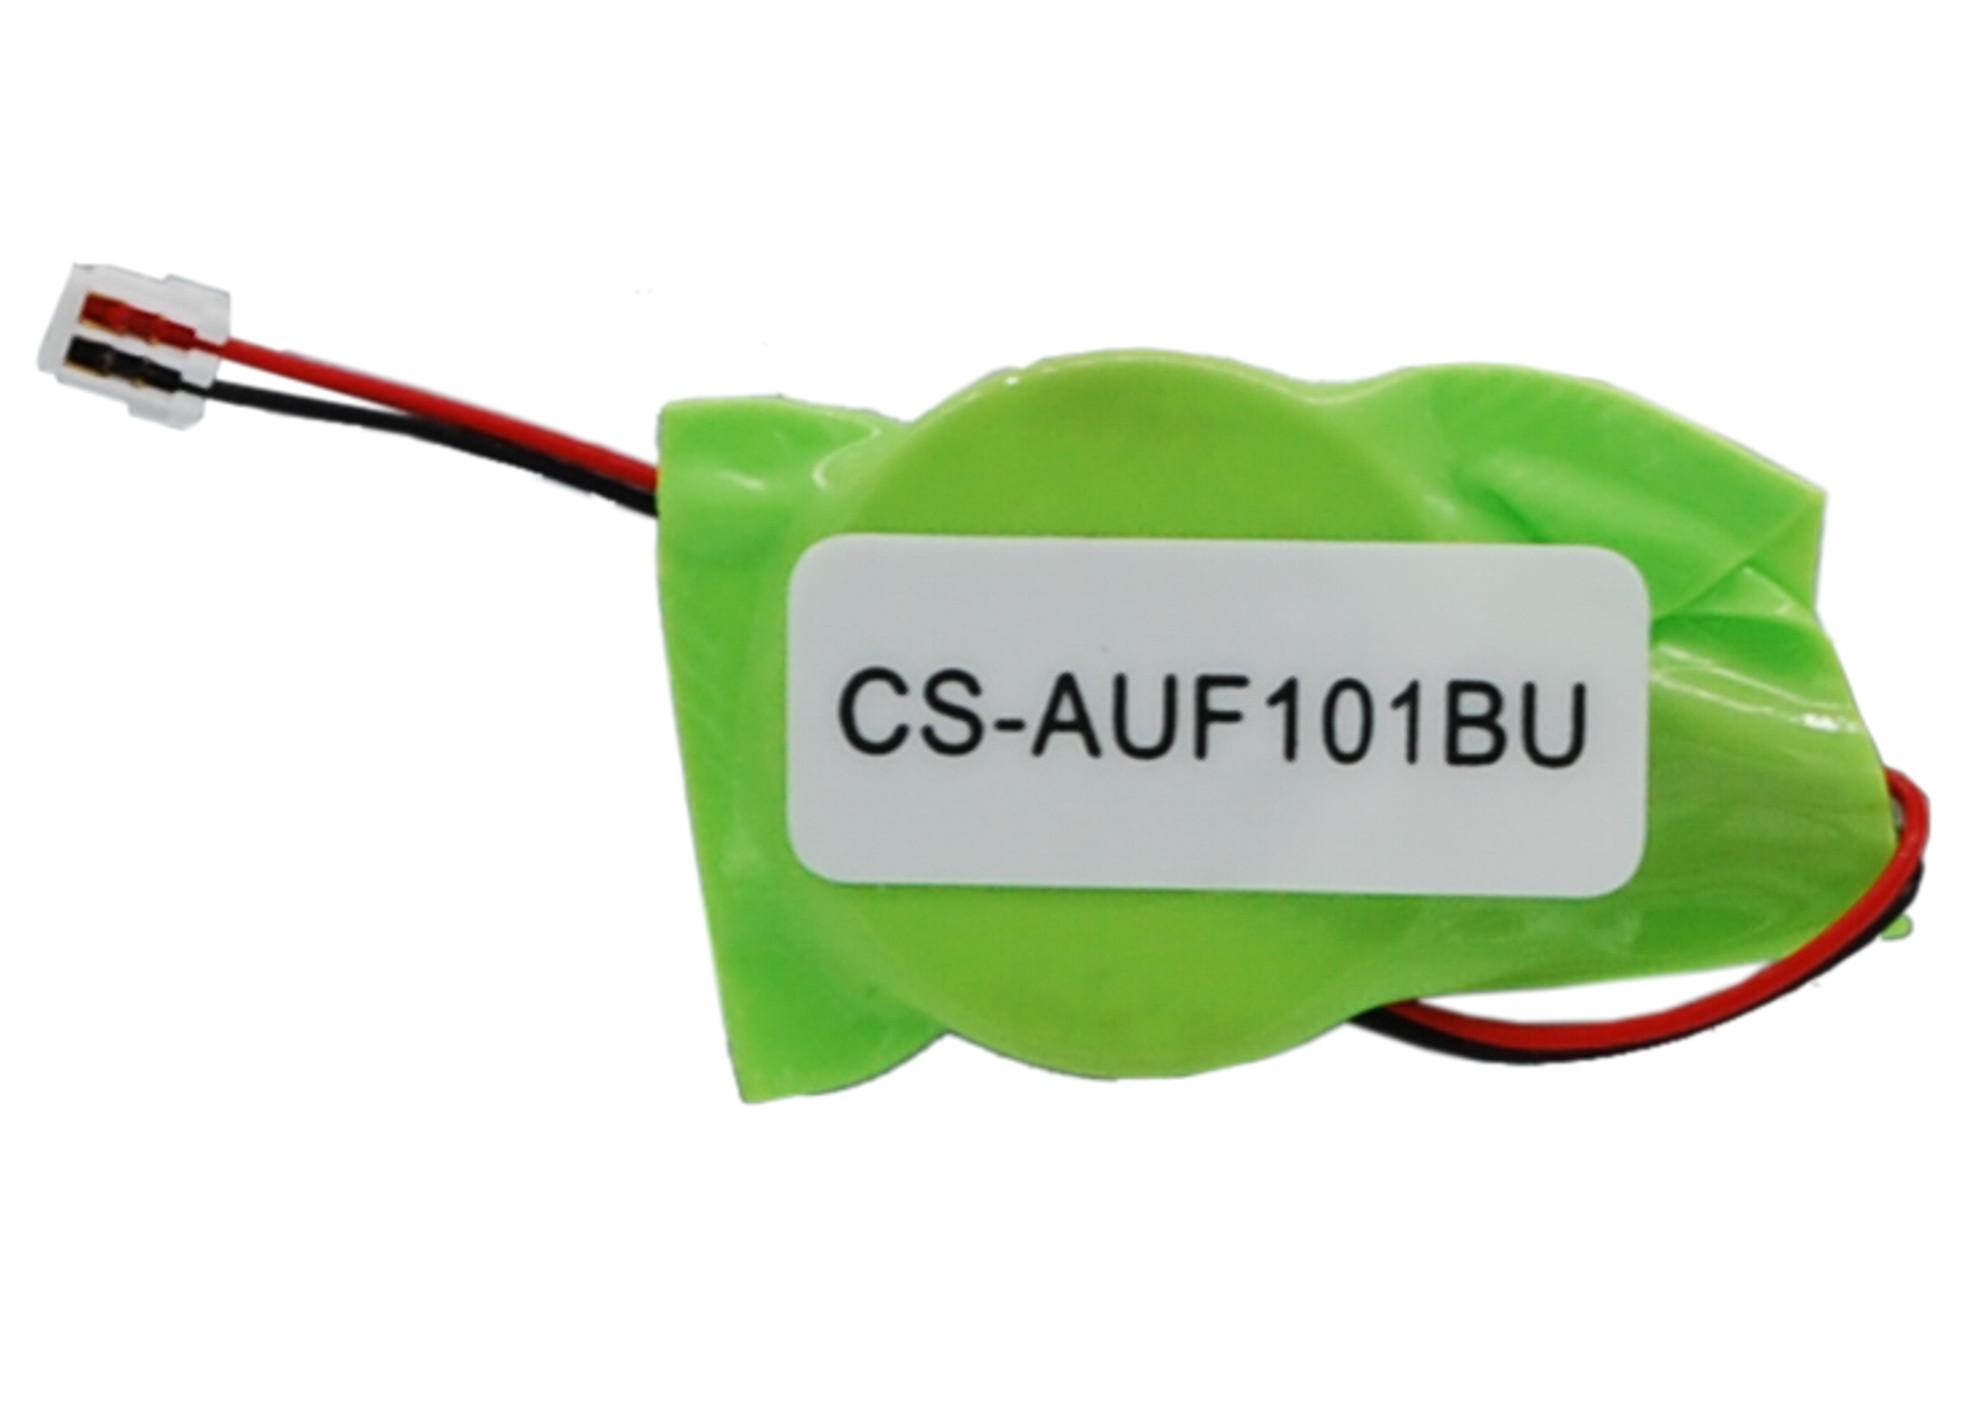 Cameron Sino baterie cmos pro ASUS Eee Pad Transformer TF101G-1B115A 3V Li-ion 40mAh zelená - neoriginální